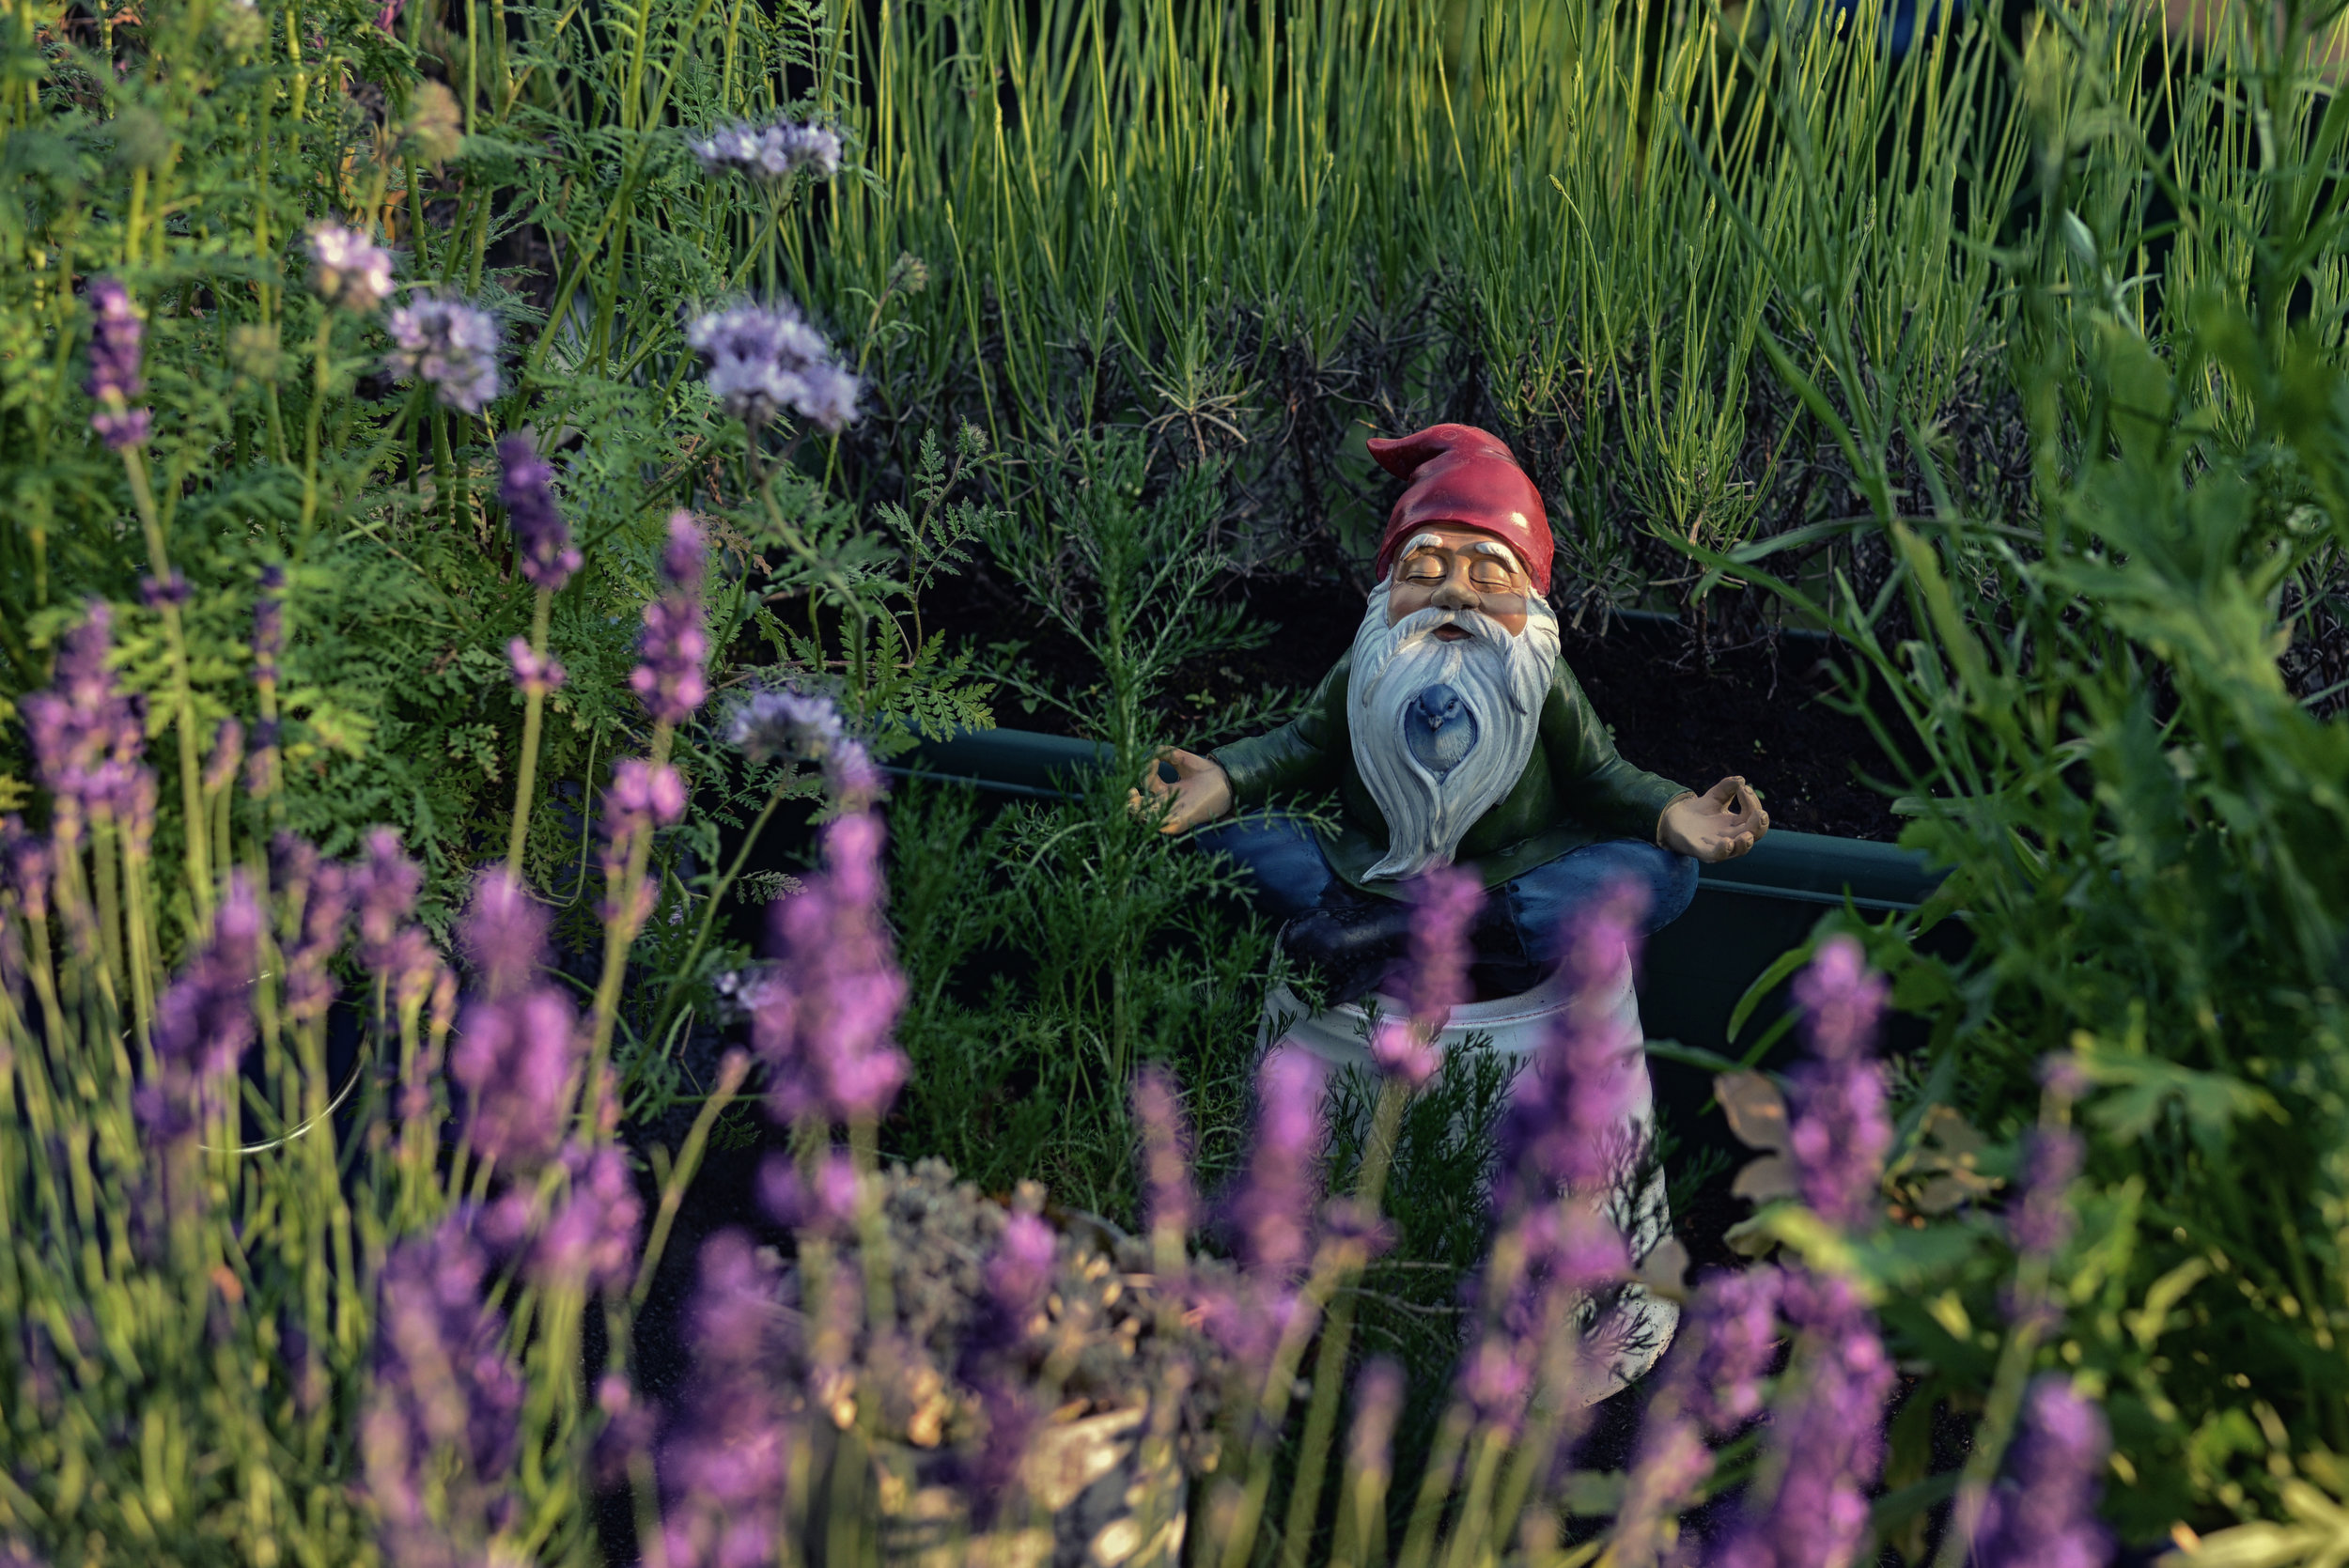 Spiritual Gardening and Unseen Beings - Spring 2018